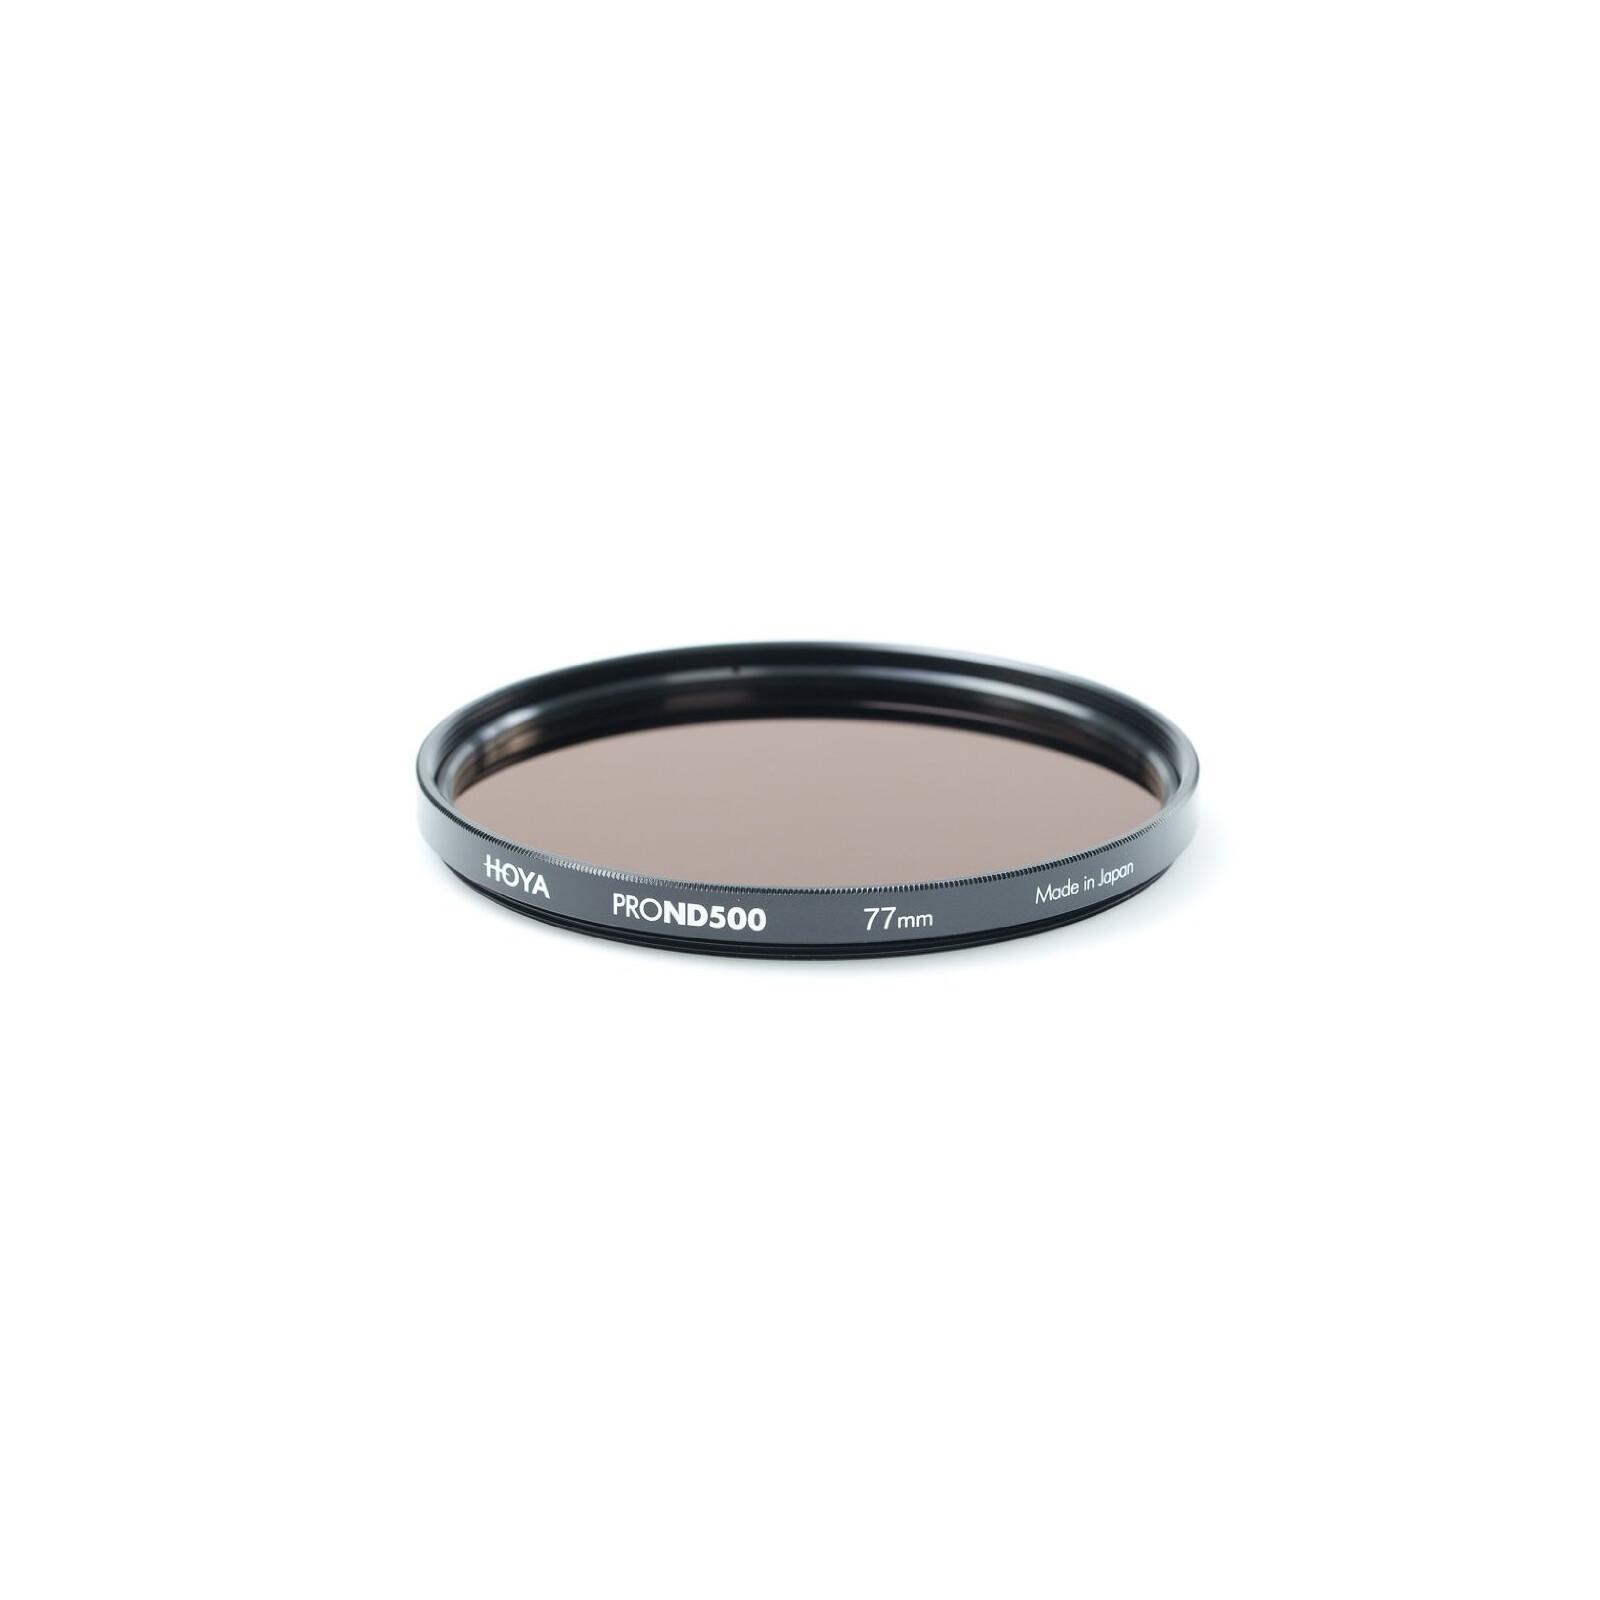 Hoya Grau PRO ND 500 77mm